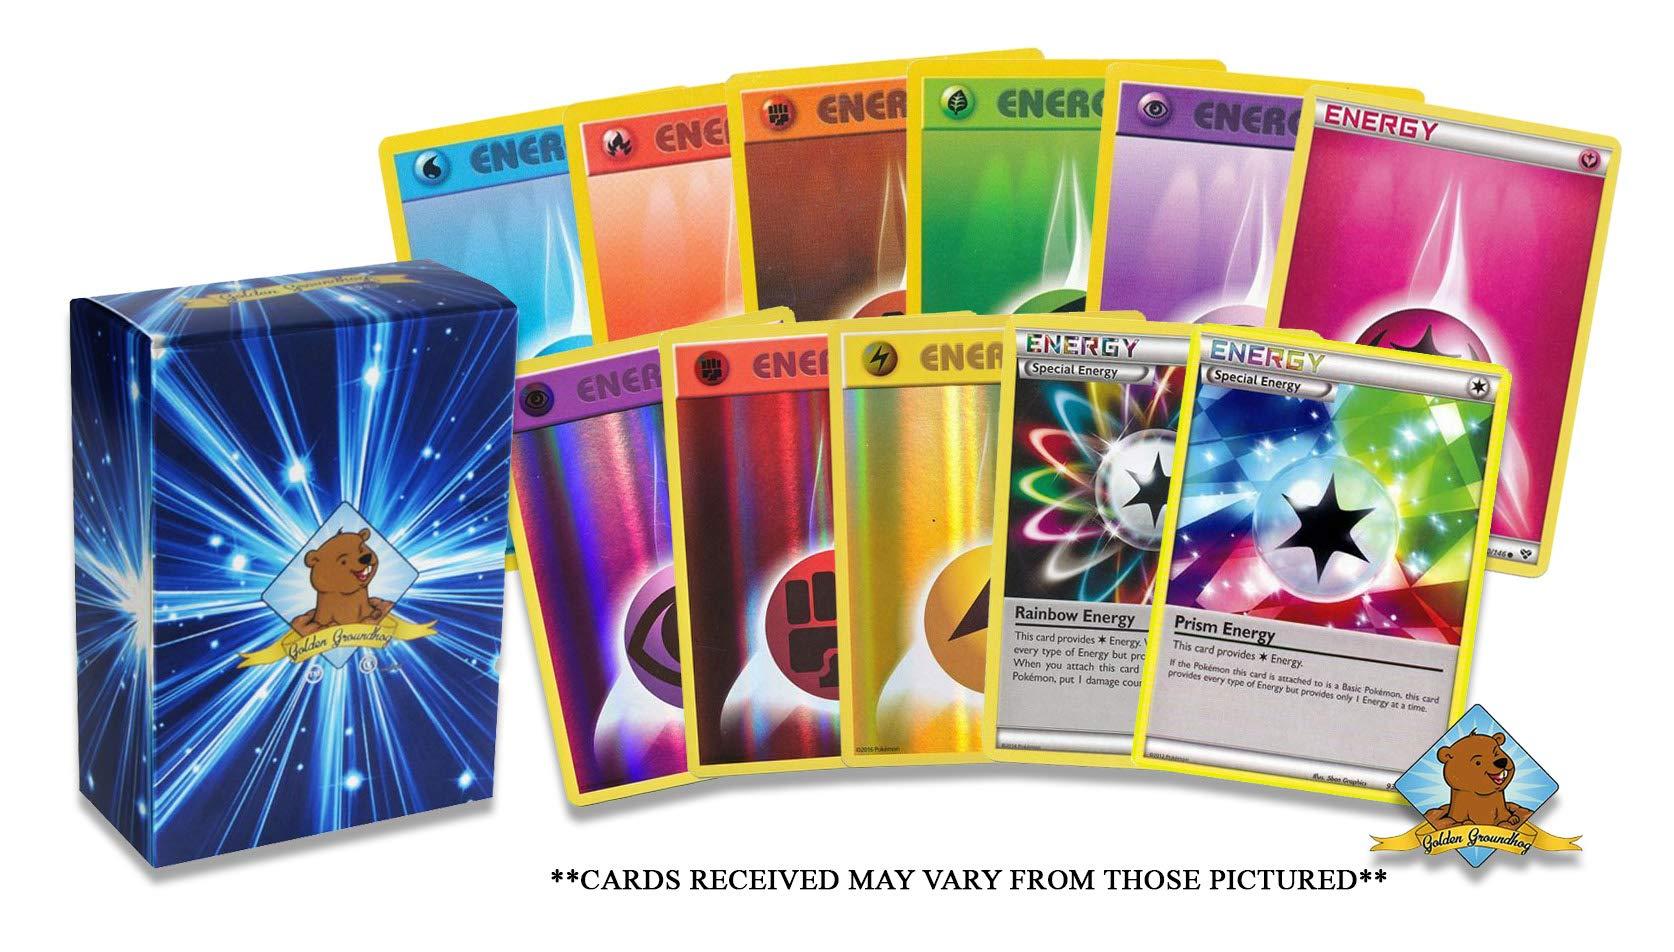 100 Pokemon Energy Cards Includes 90 Basic Energy Cards, 5 Holo Energy Cards, 5 Special Non-Basic Energy Cards! Includes Golden Groundhog Storage Box!